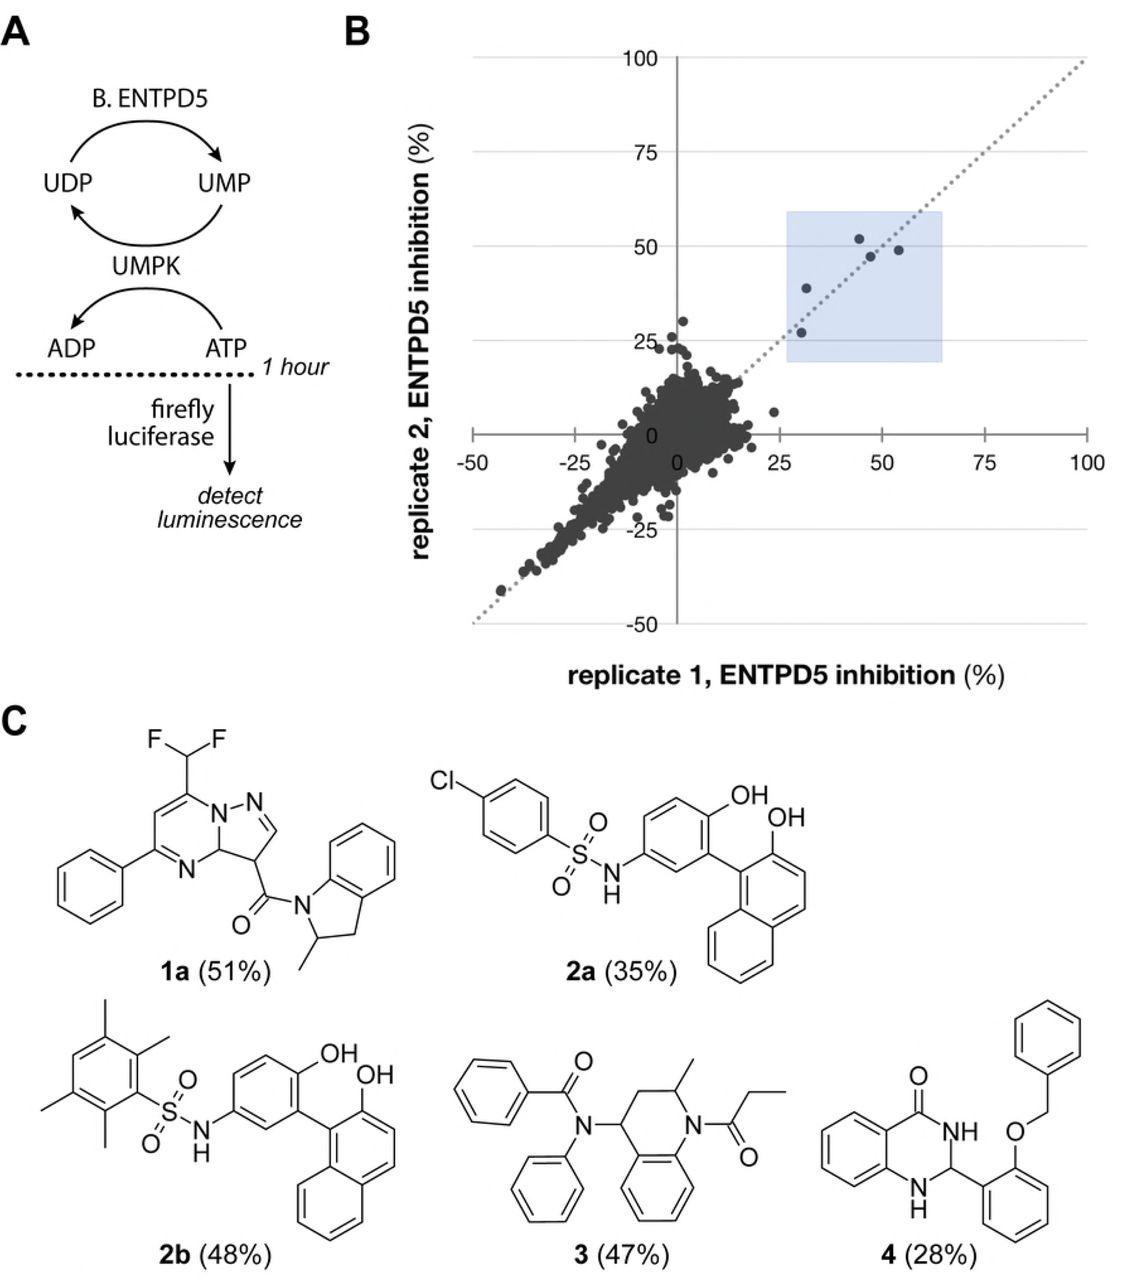 Identifying small molecule probes of ENTPD5 through high throughput